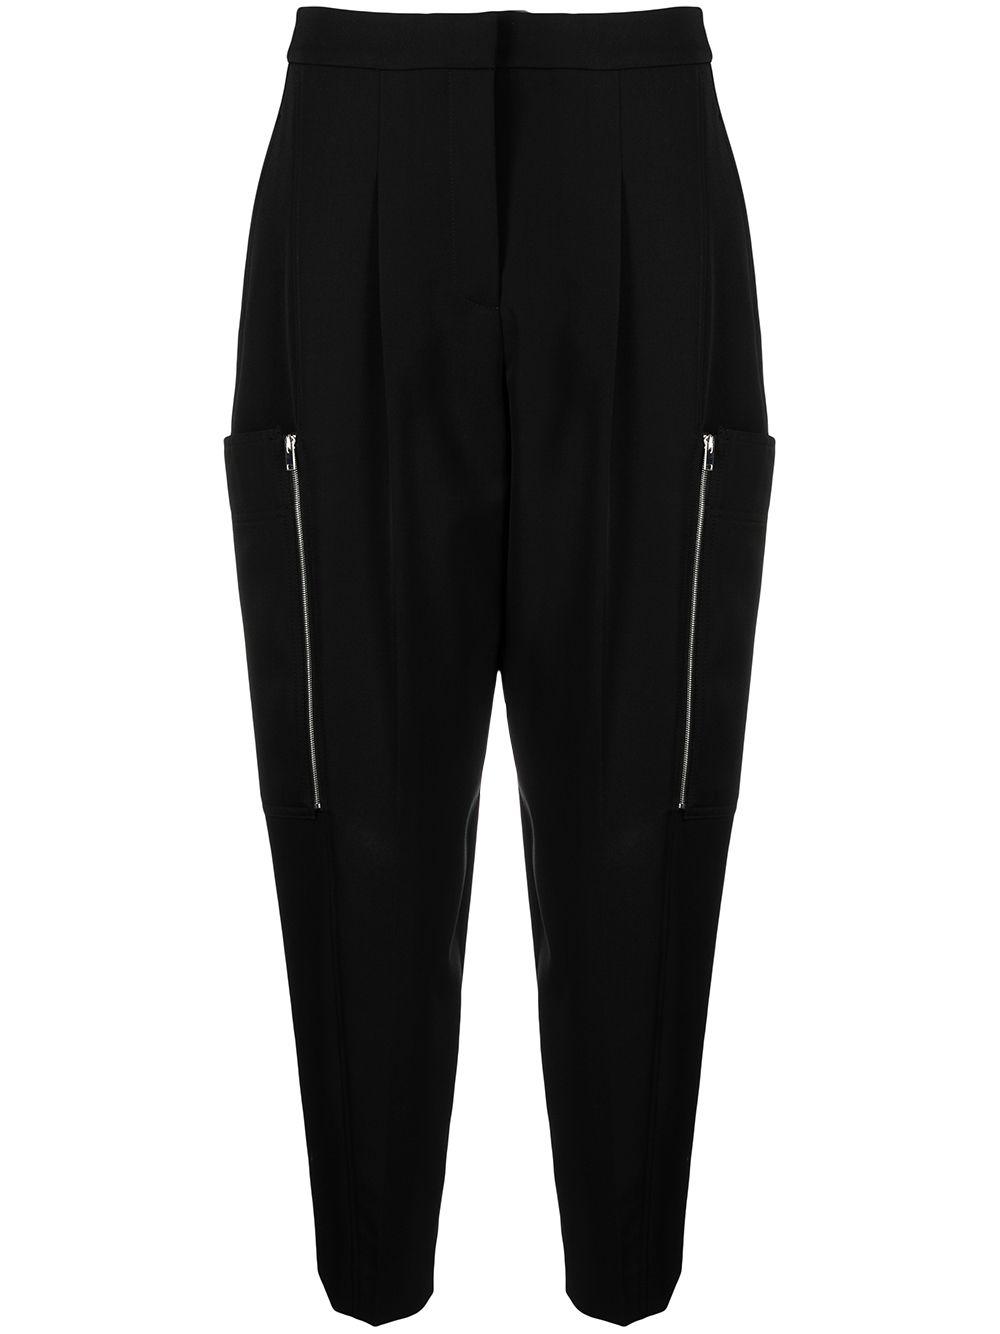 Pantaloni neri in twill di lana Liv con vita alta STELLA MC CARTNEY | Pantaloni | 602929-SPA281000